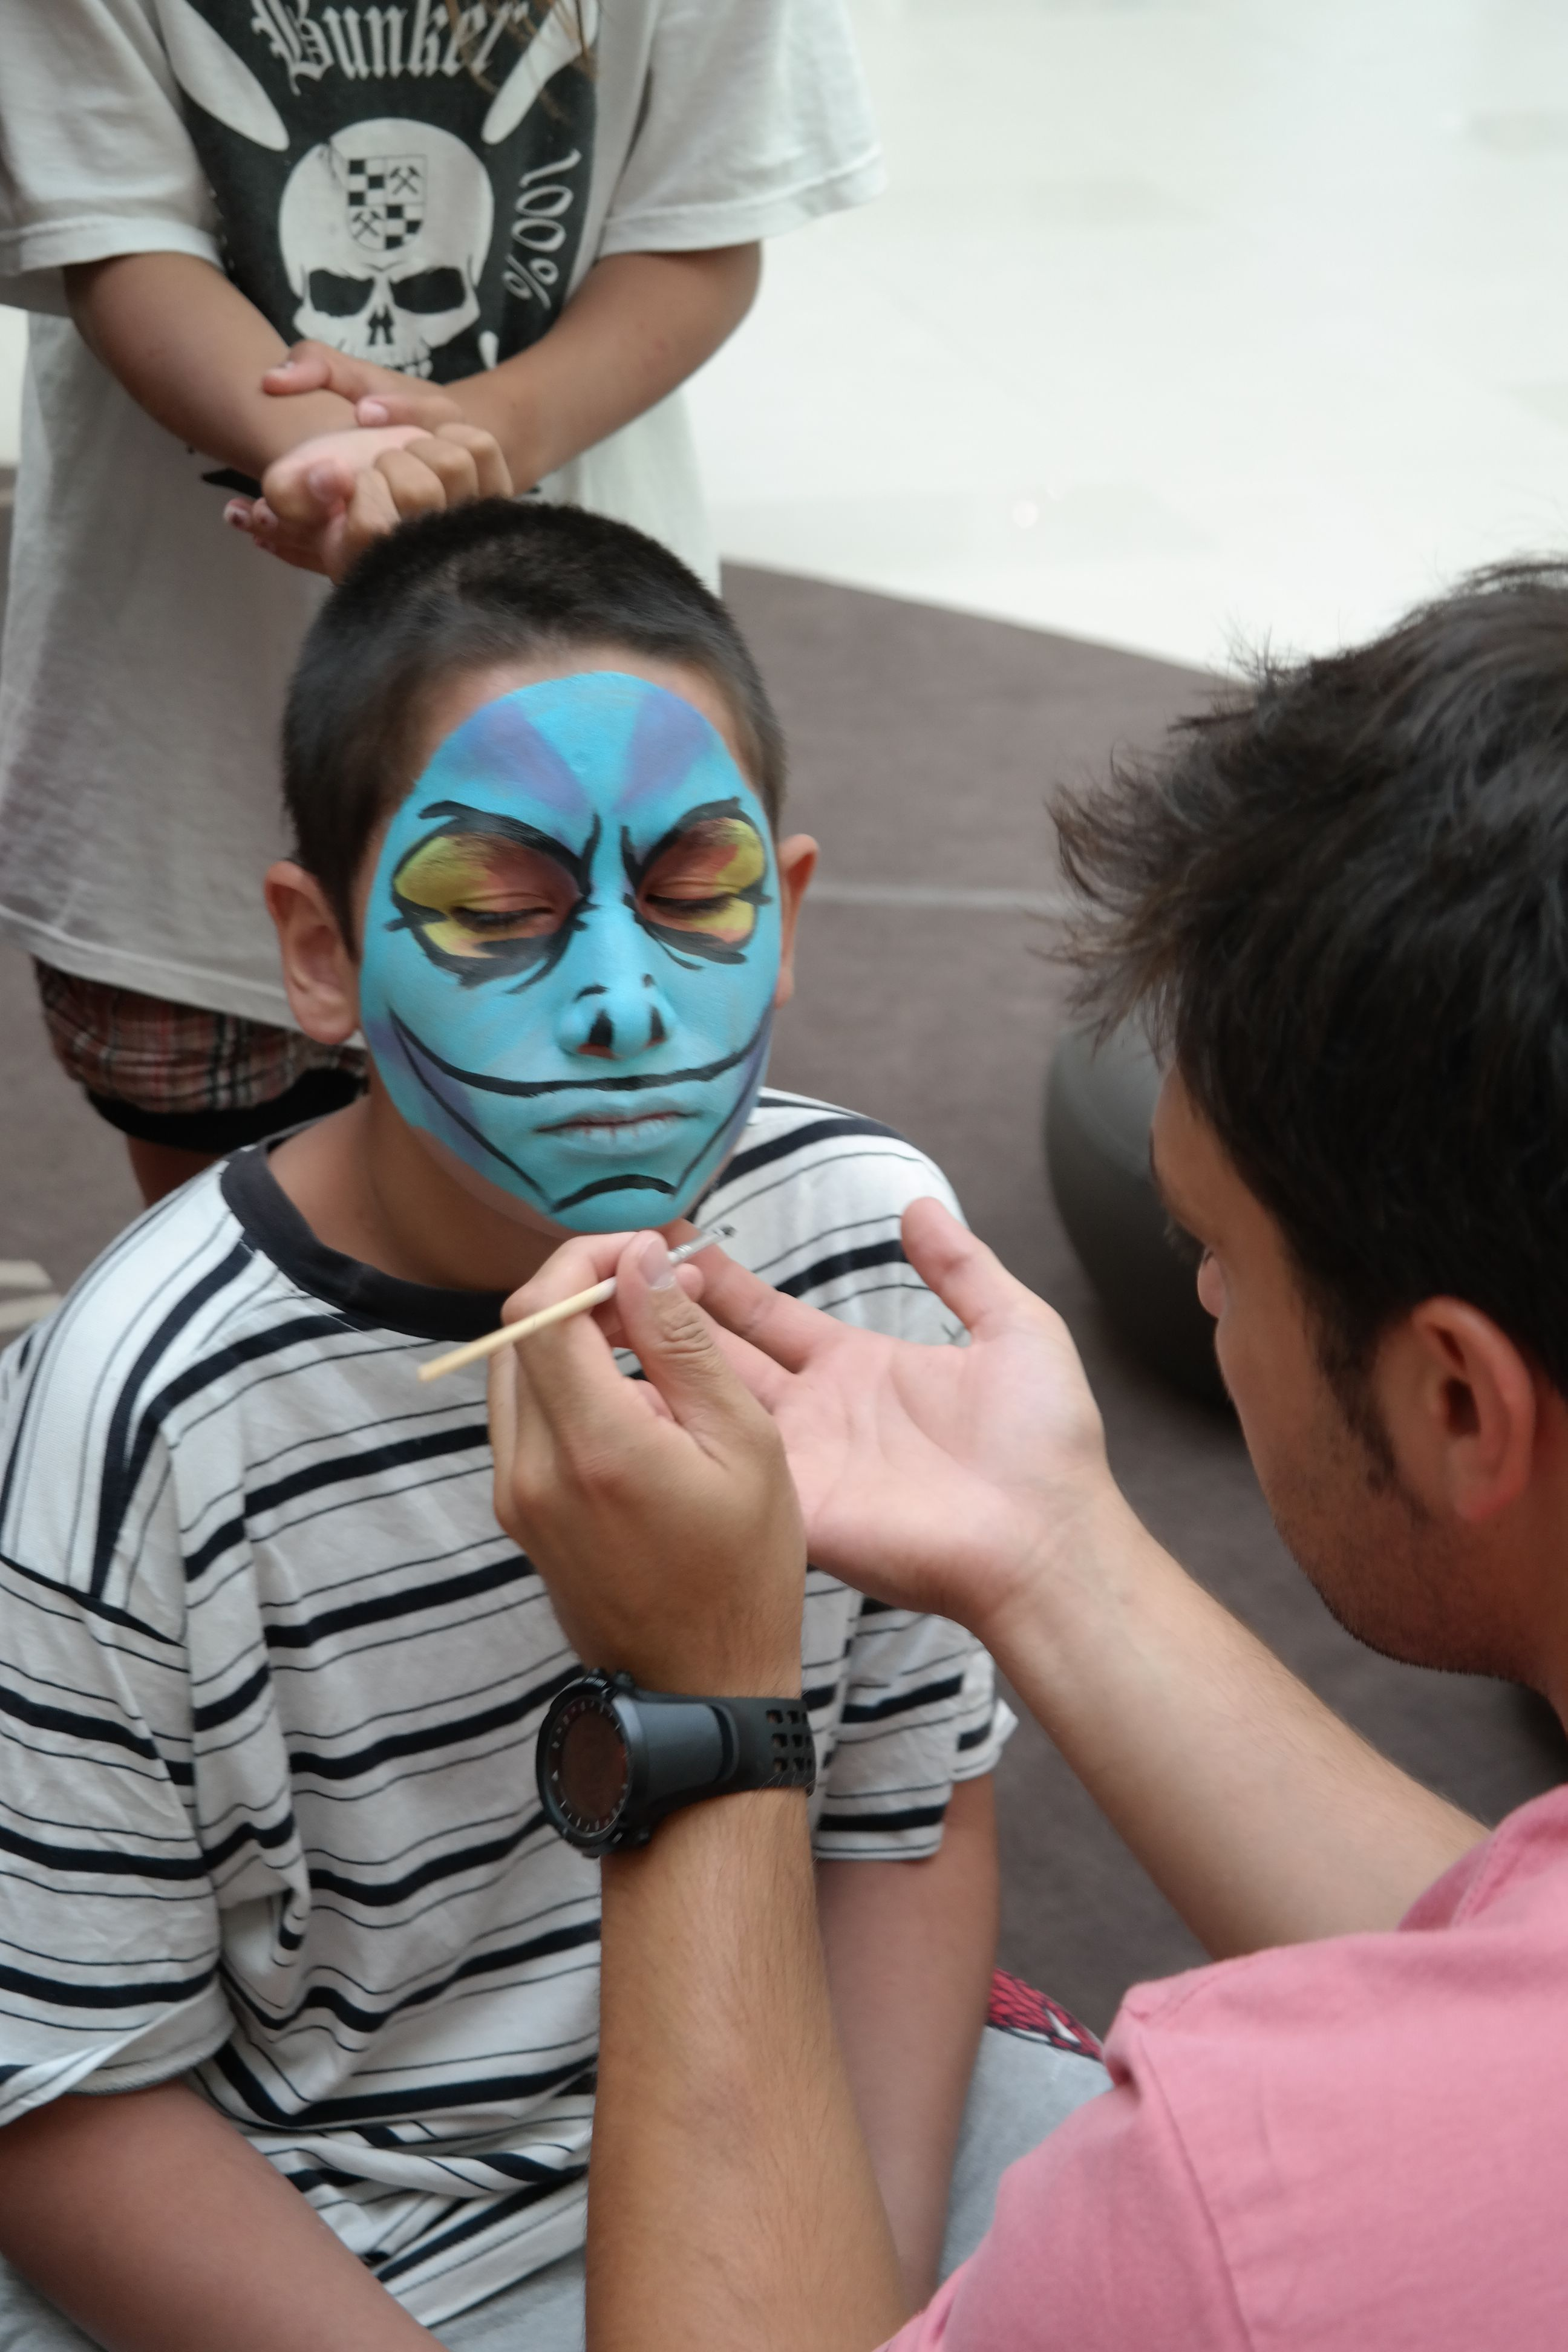 Подготовка за концерта на Рафи с рисунка на лице.